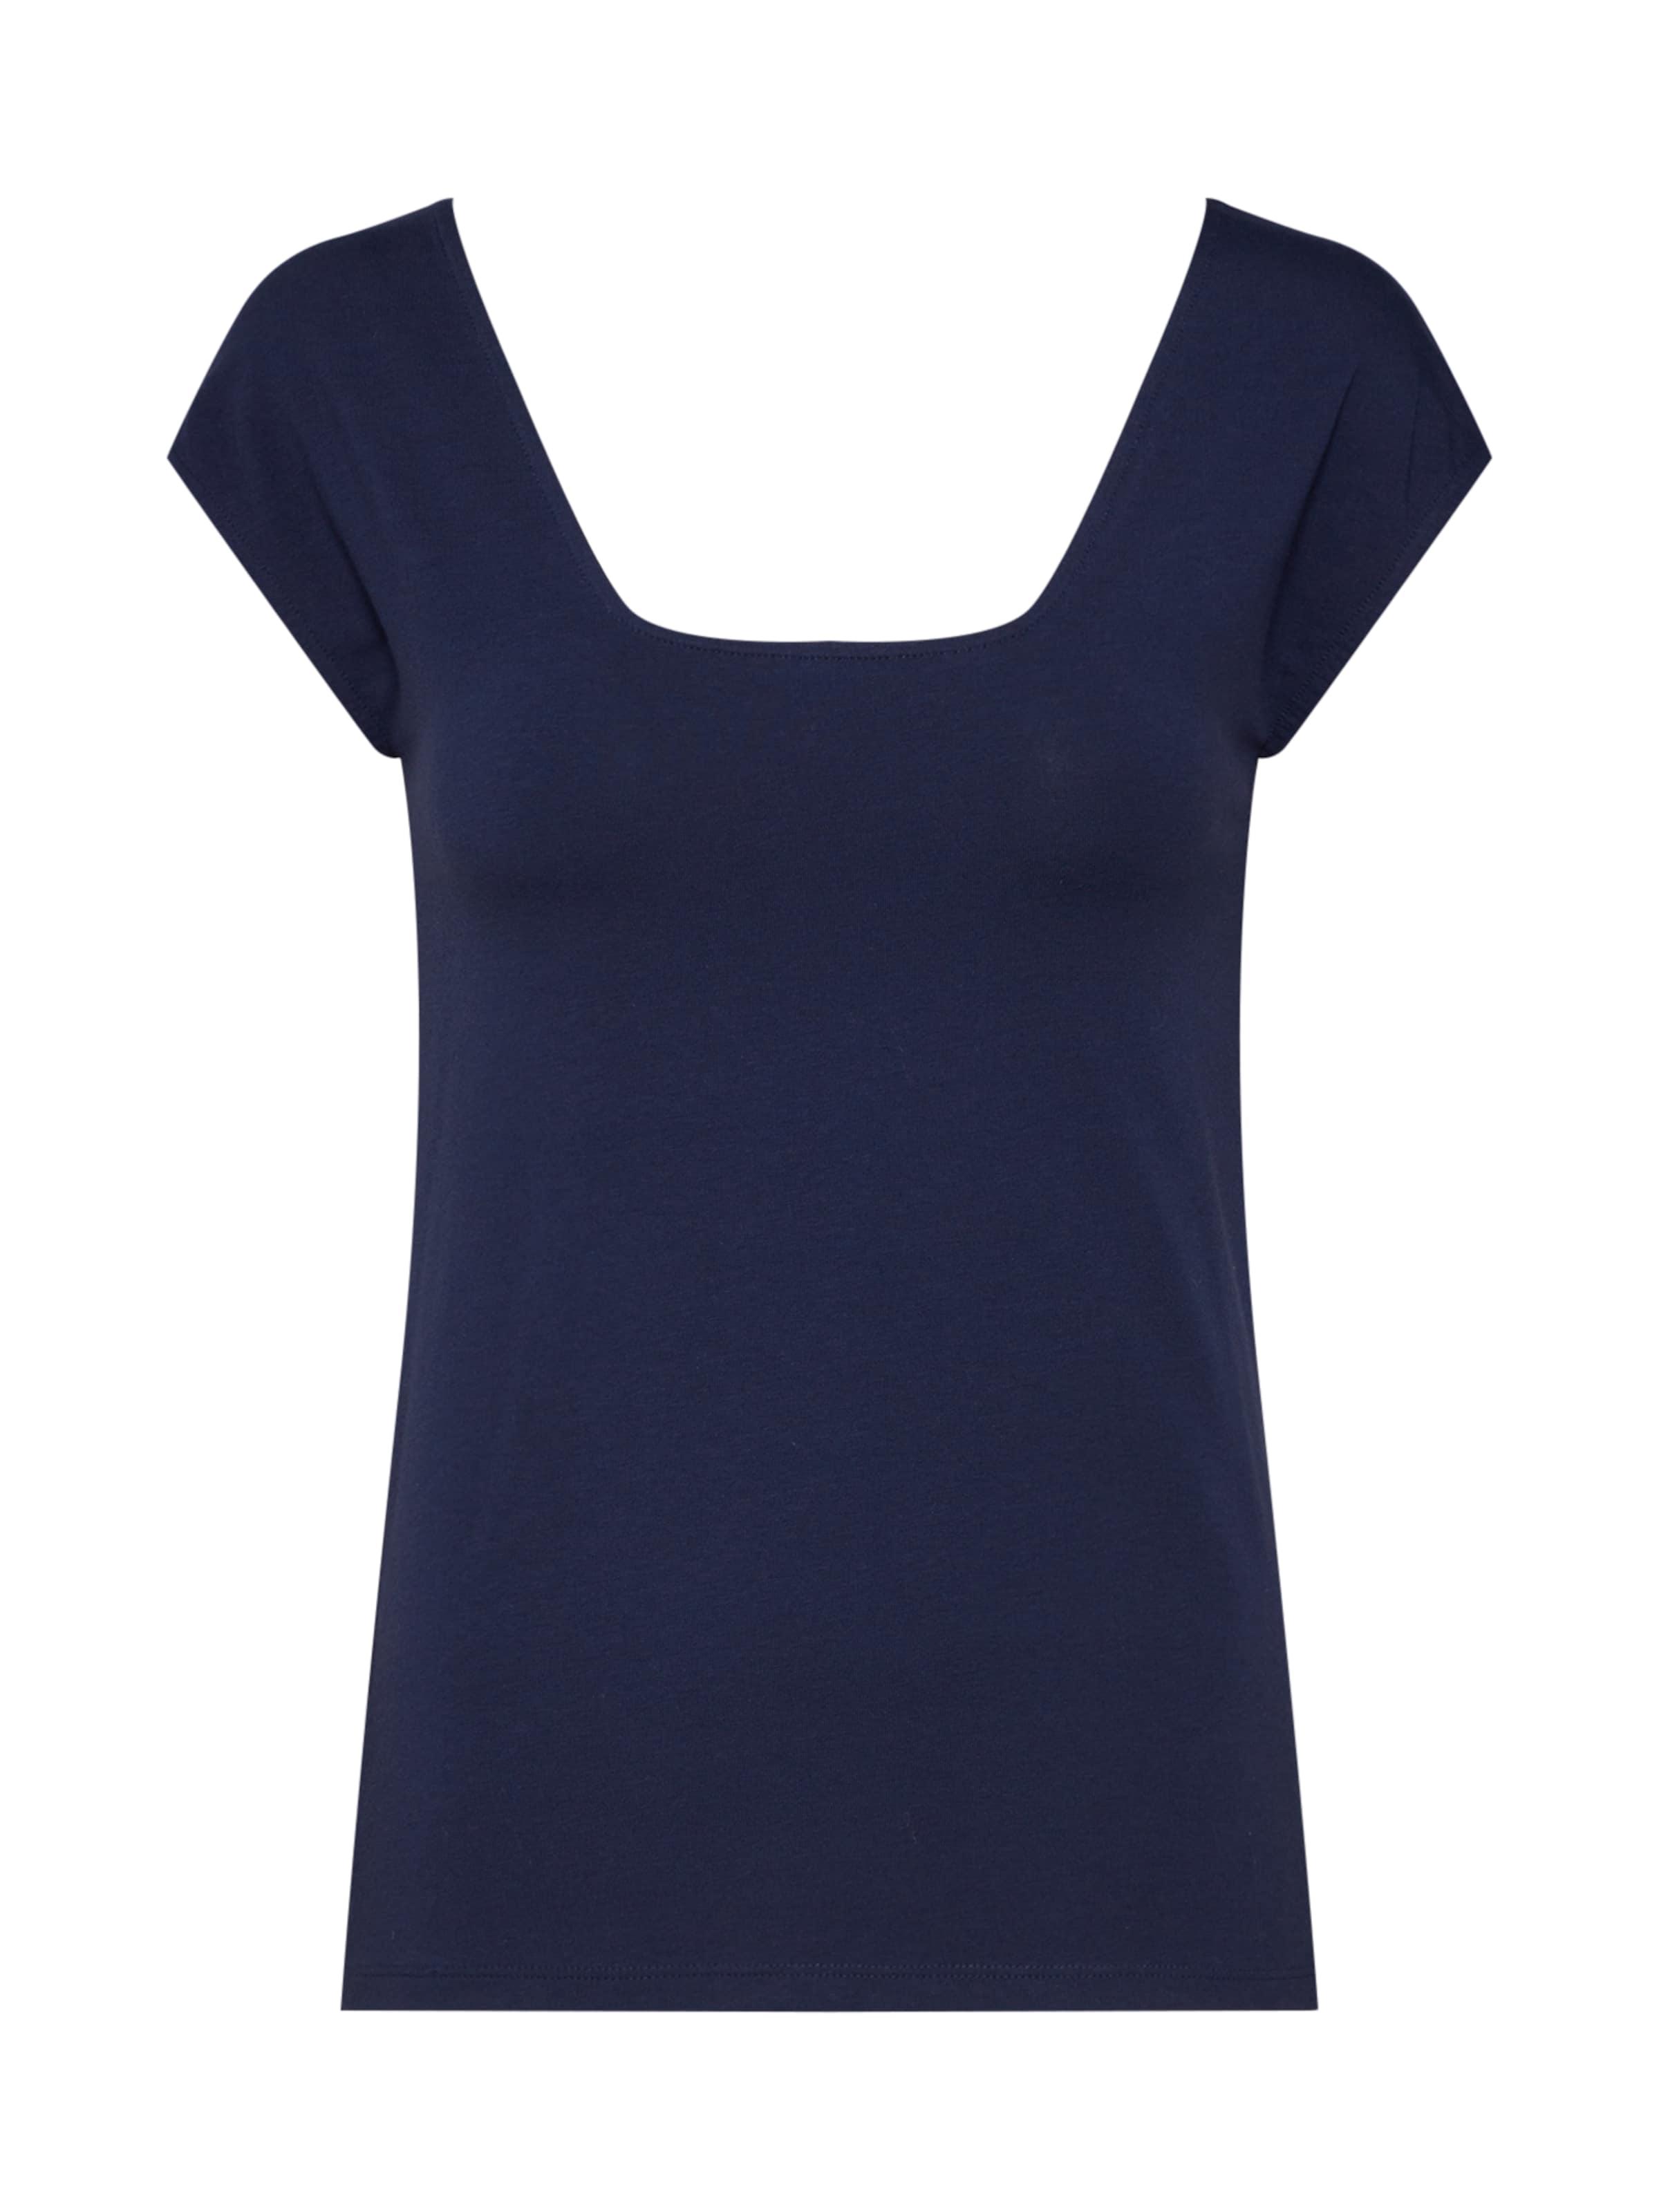 By Esprit Neck' En Marine 'square Edc T shirt Bleu 67gbfYyv